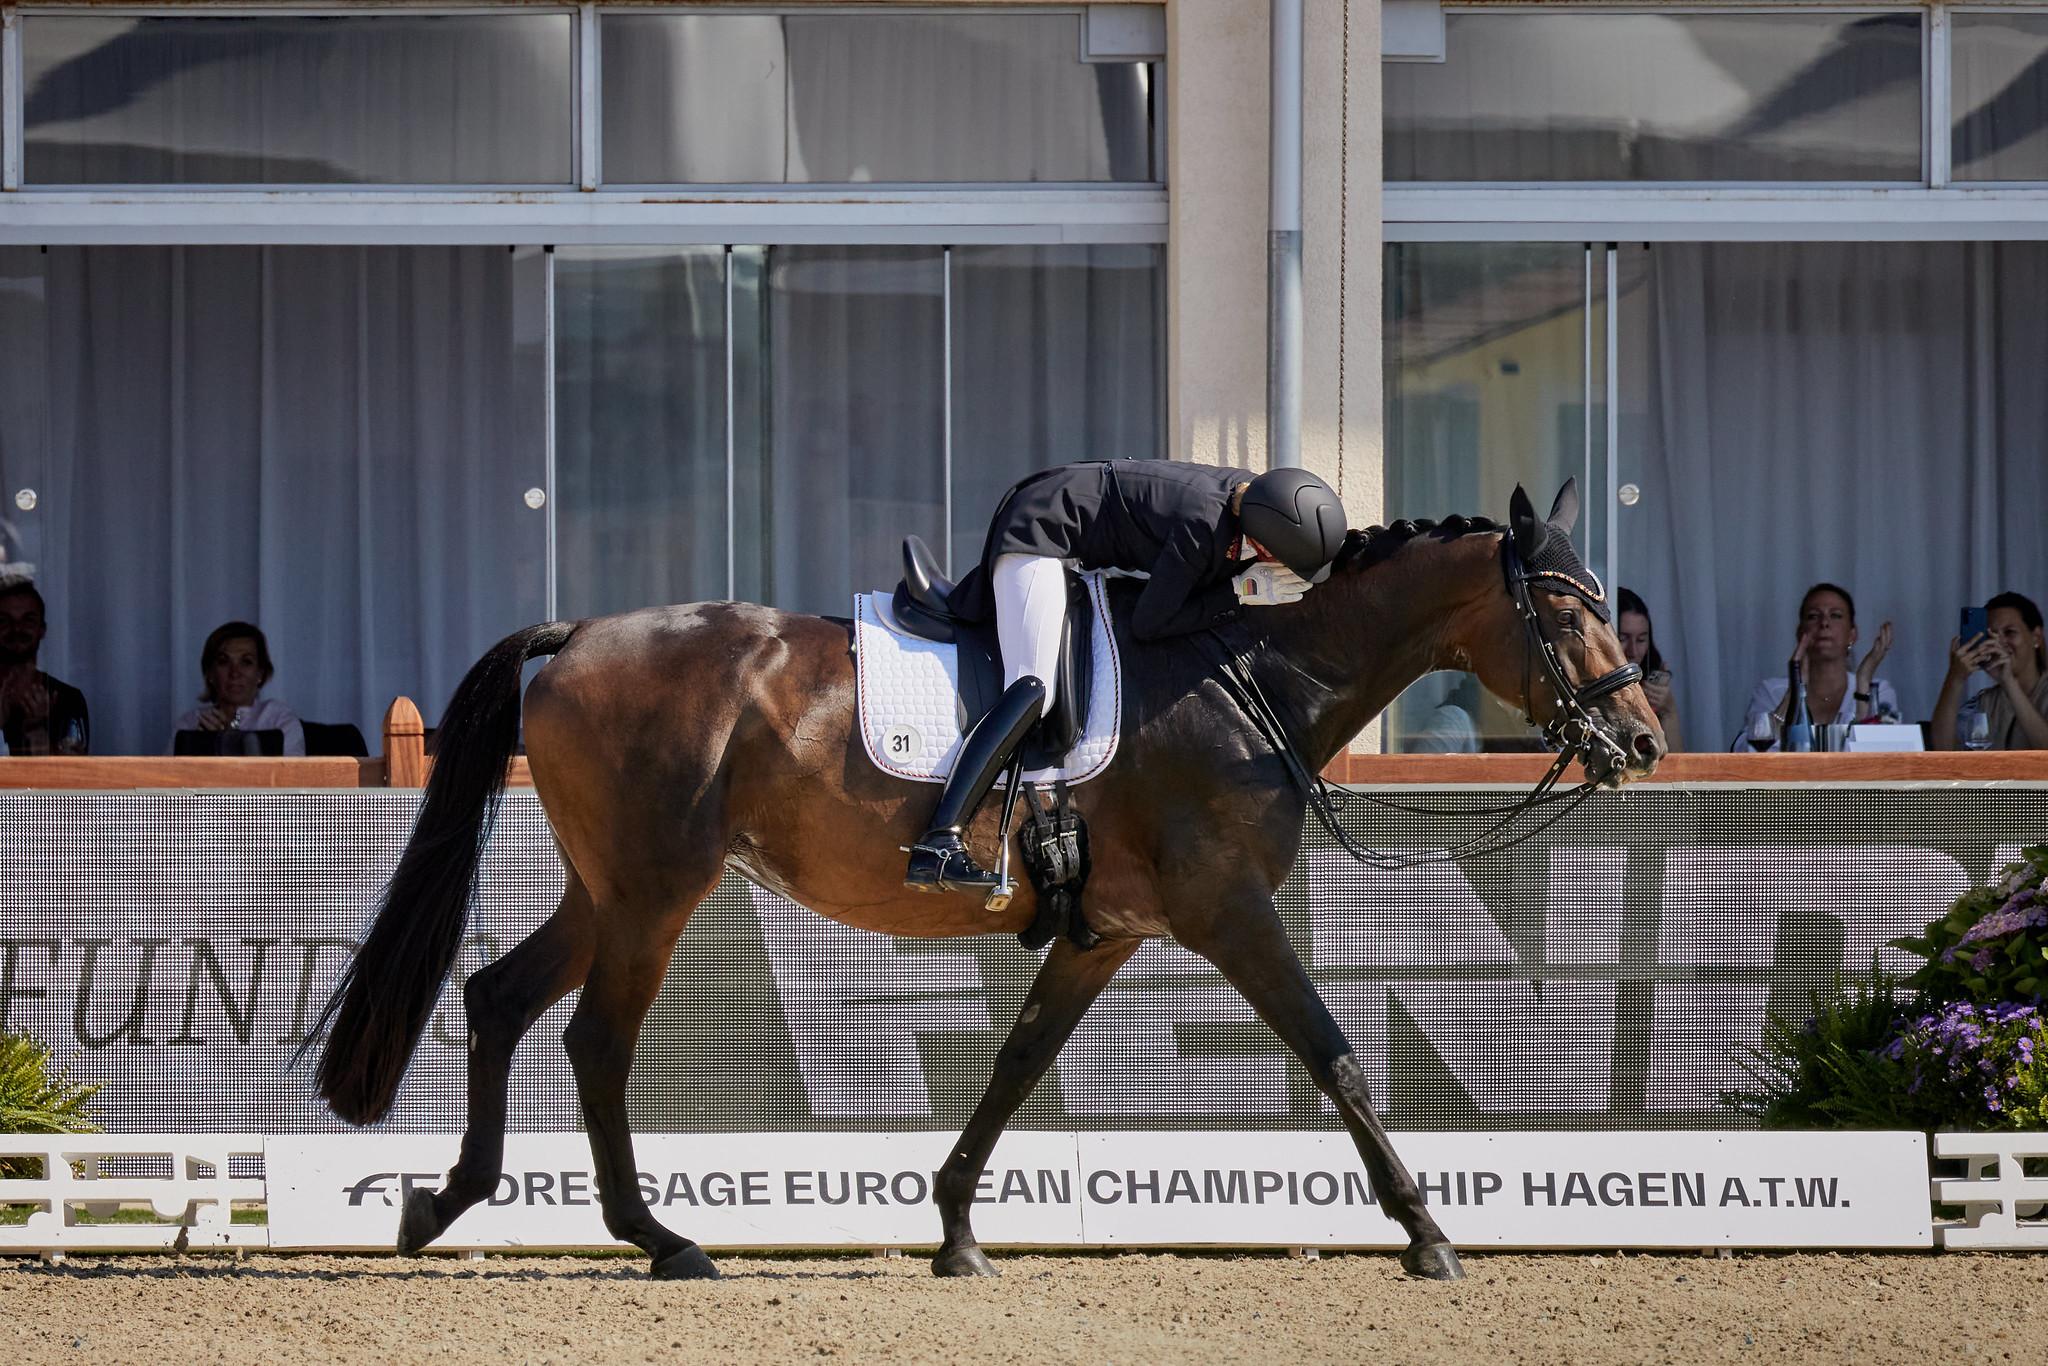 Von Bredow-Werndl wins second gold medal at FEI Dressage European Championships